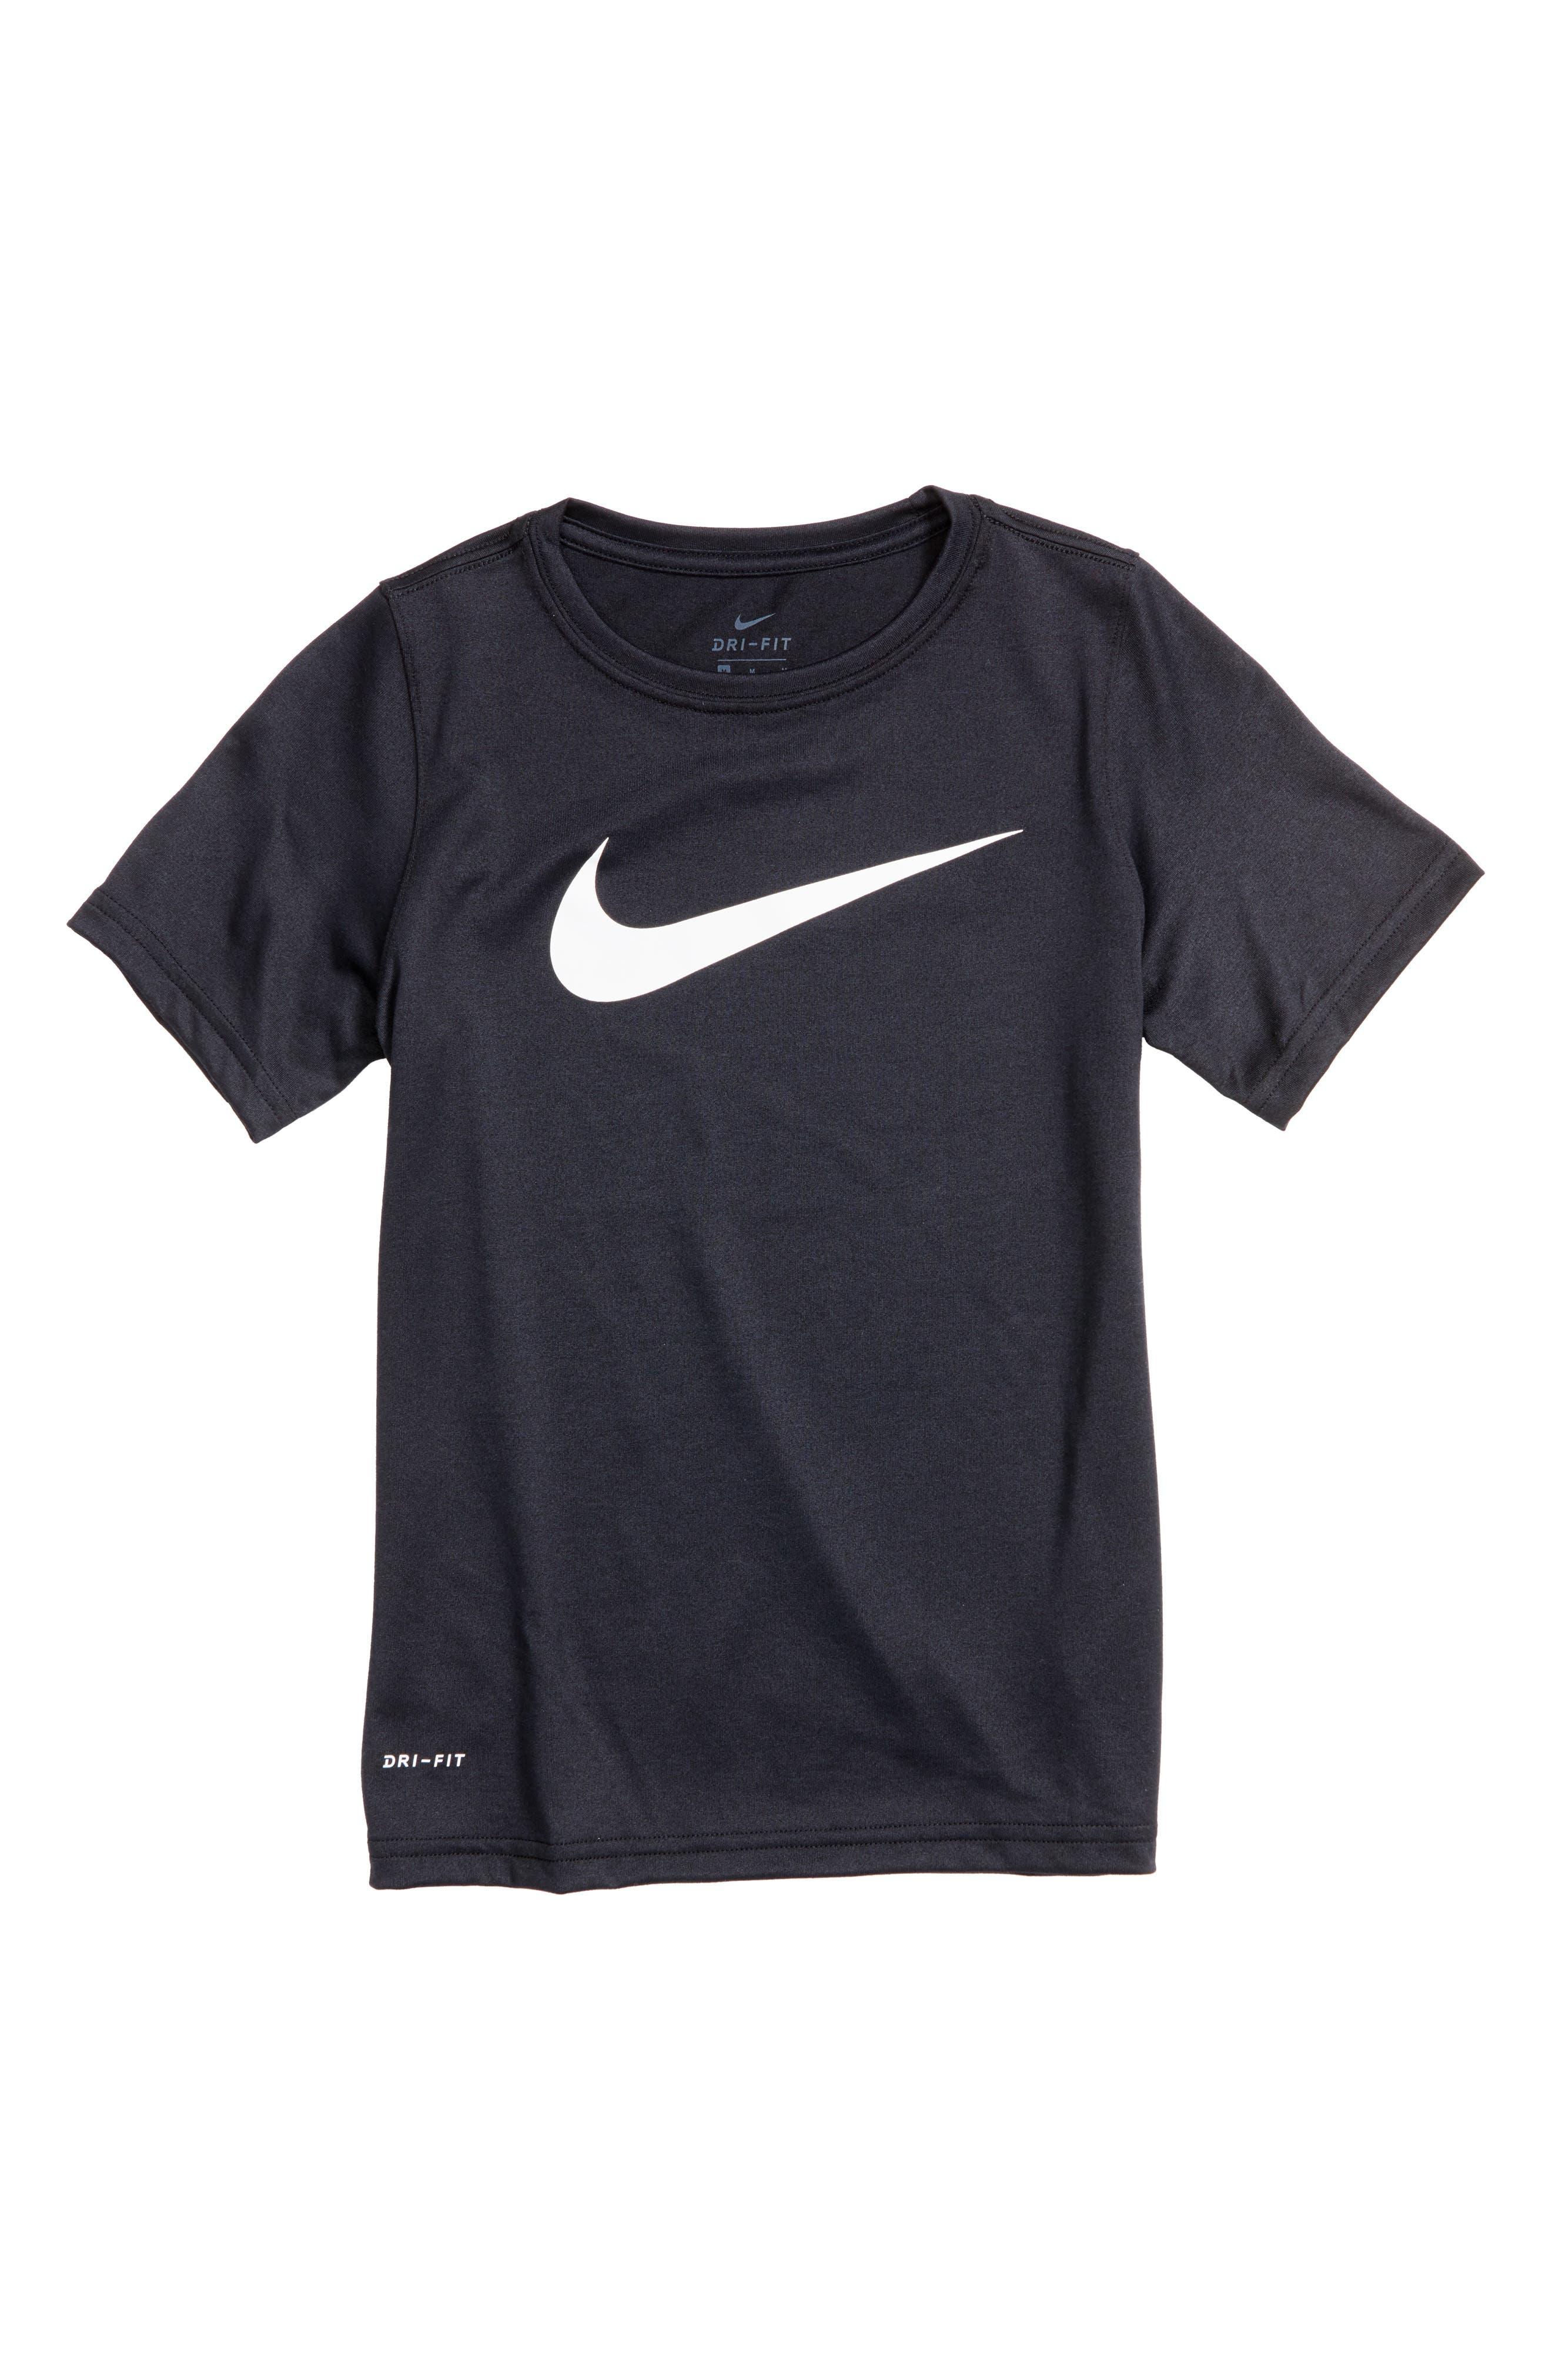 NIKE Dry Swoosh T-Shirt, Main, color, 010